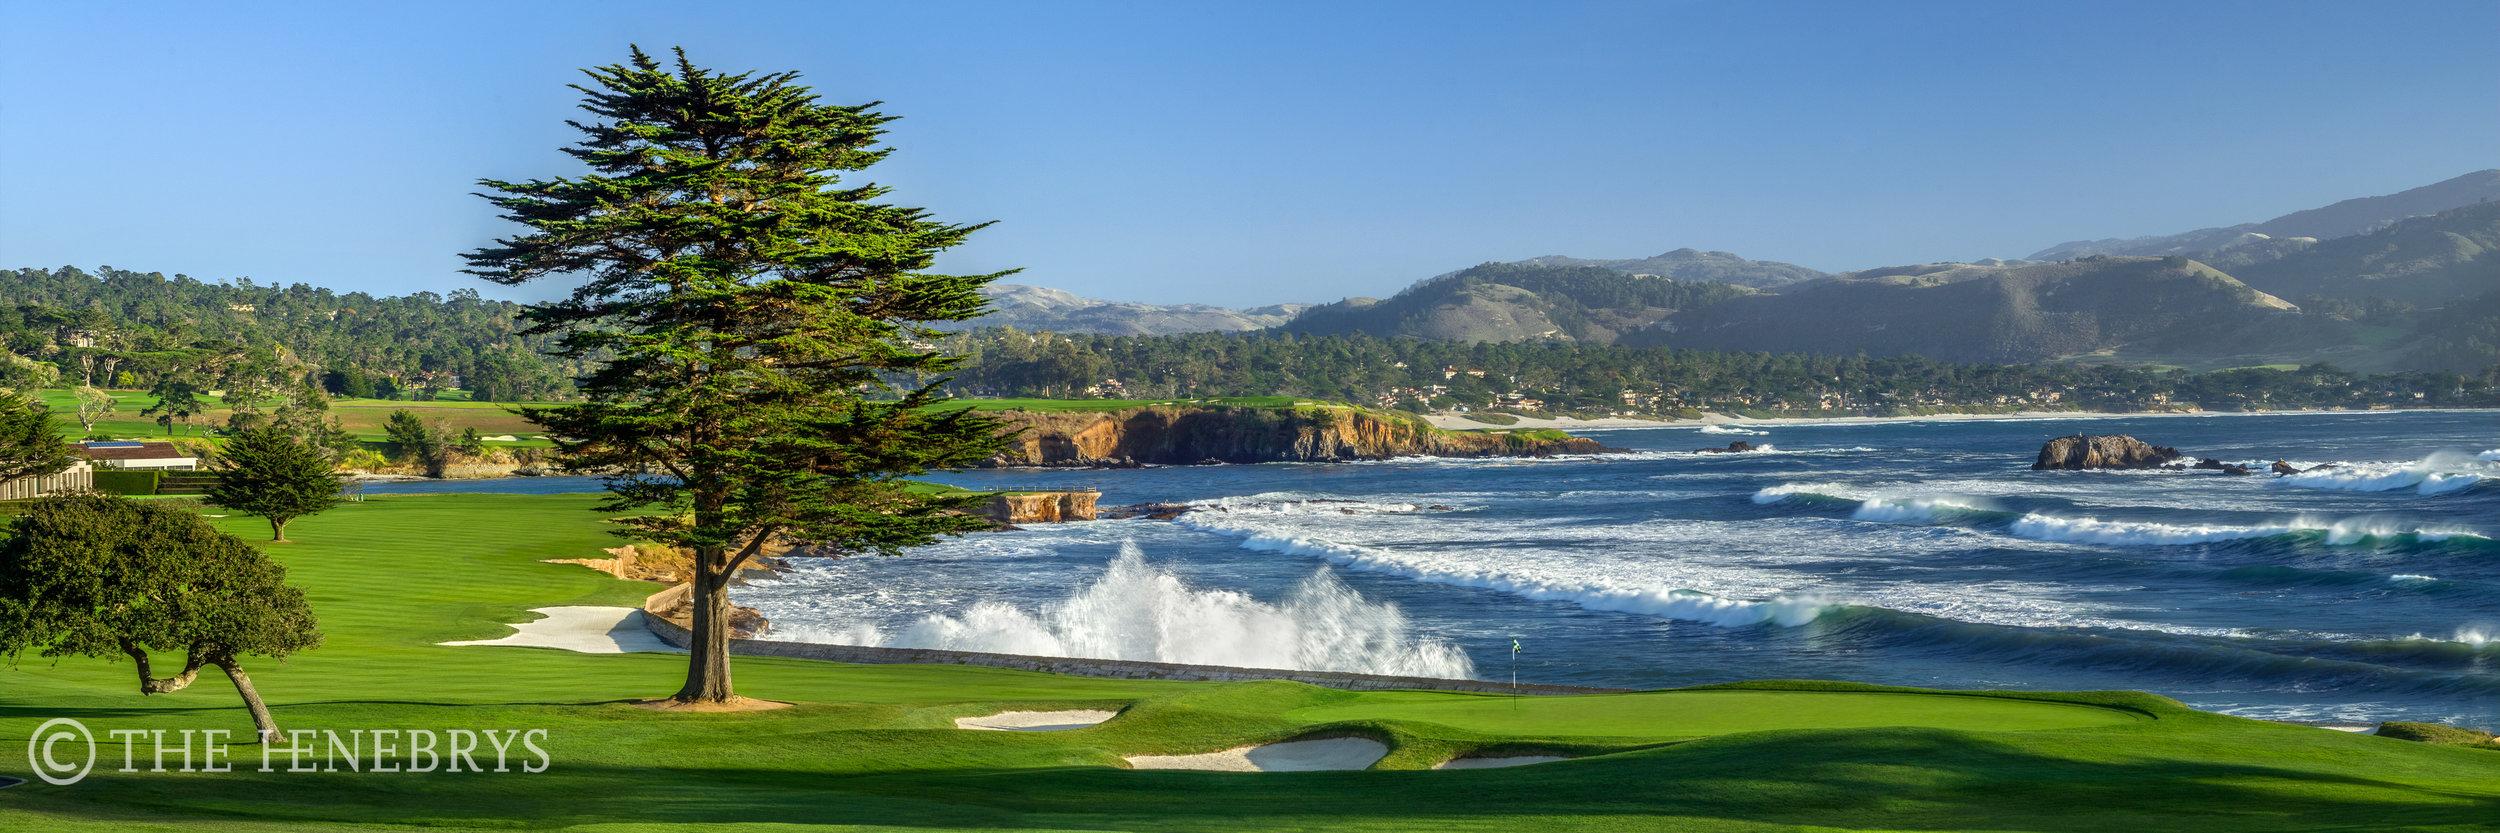 "Pebble Beach Golf Links® #18 ""December Swell"", Pebble Beach, California"